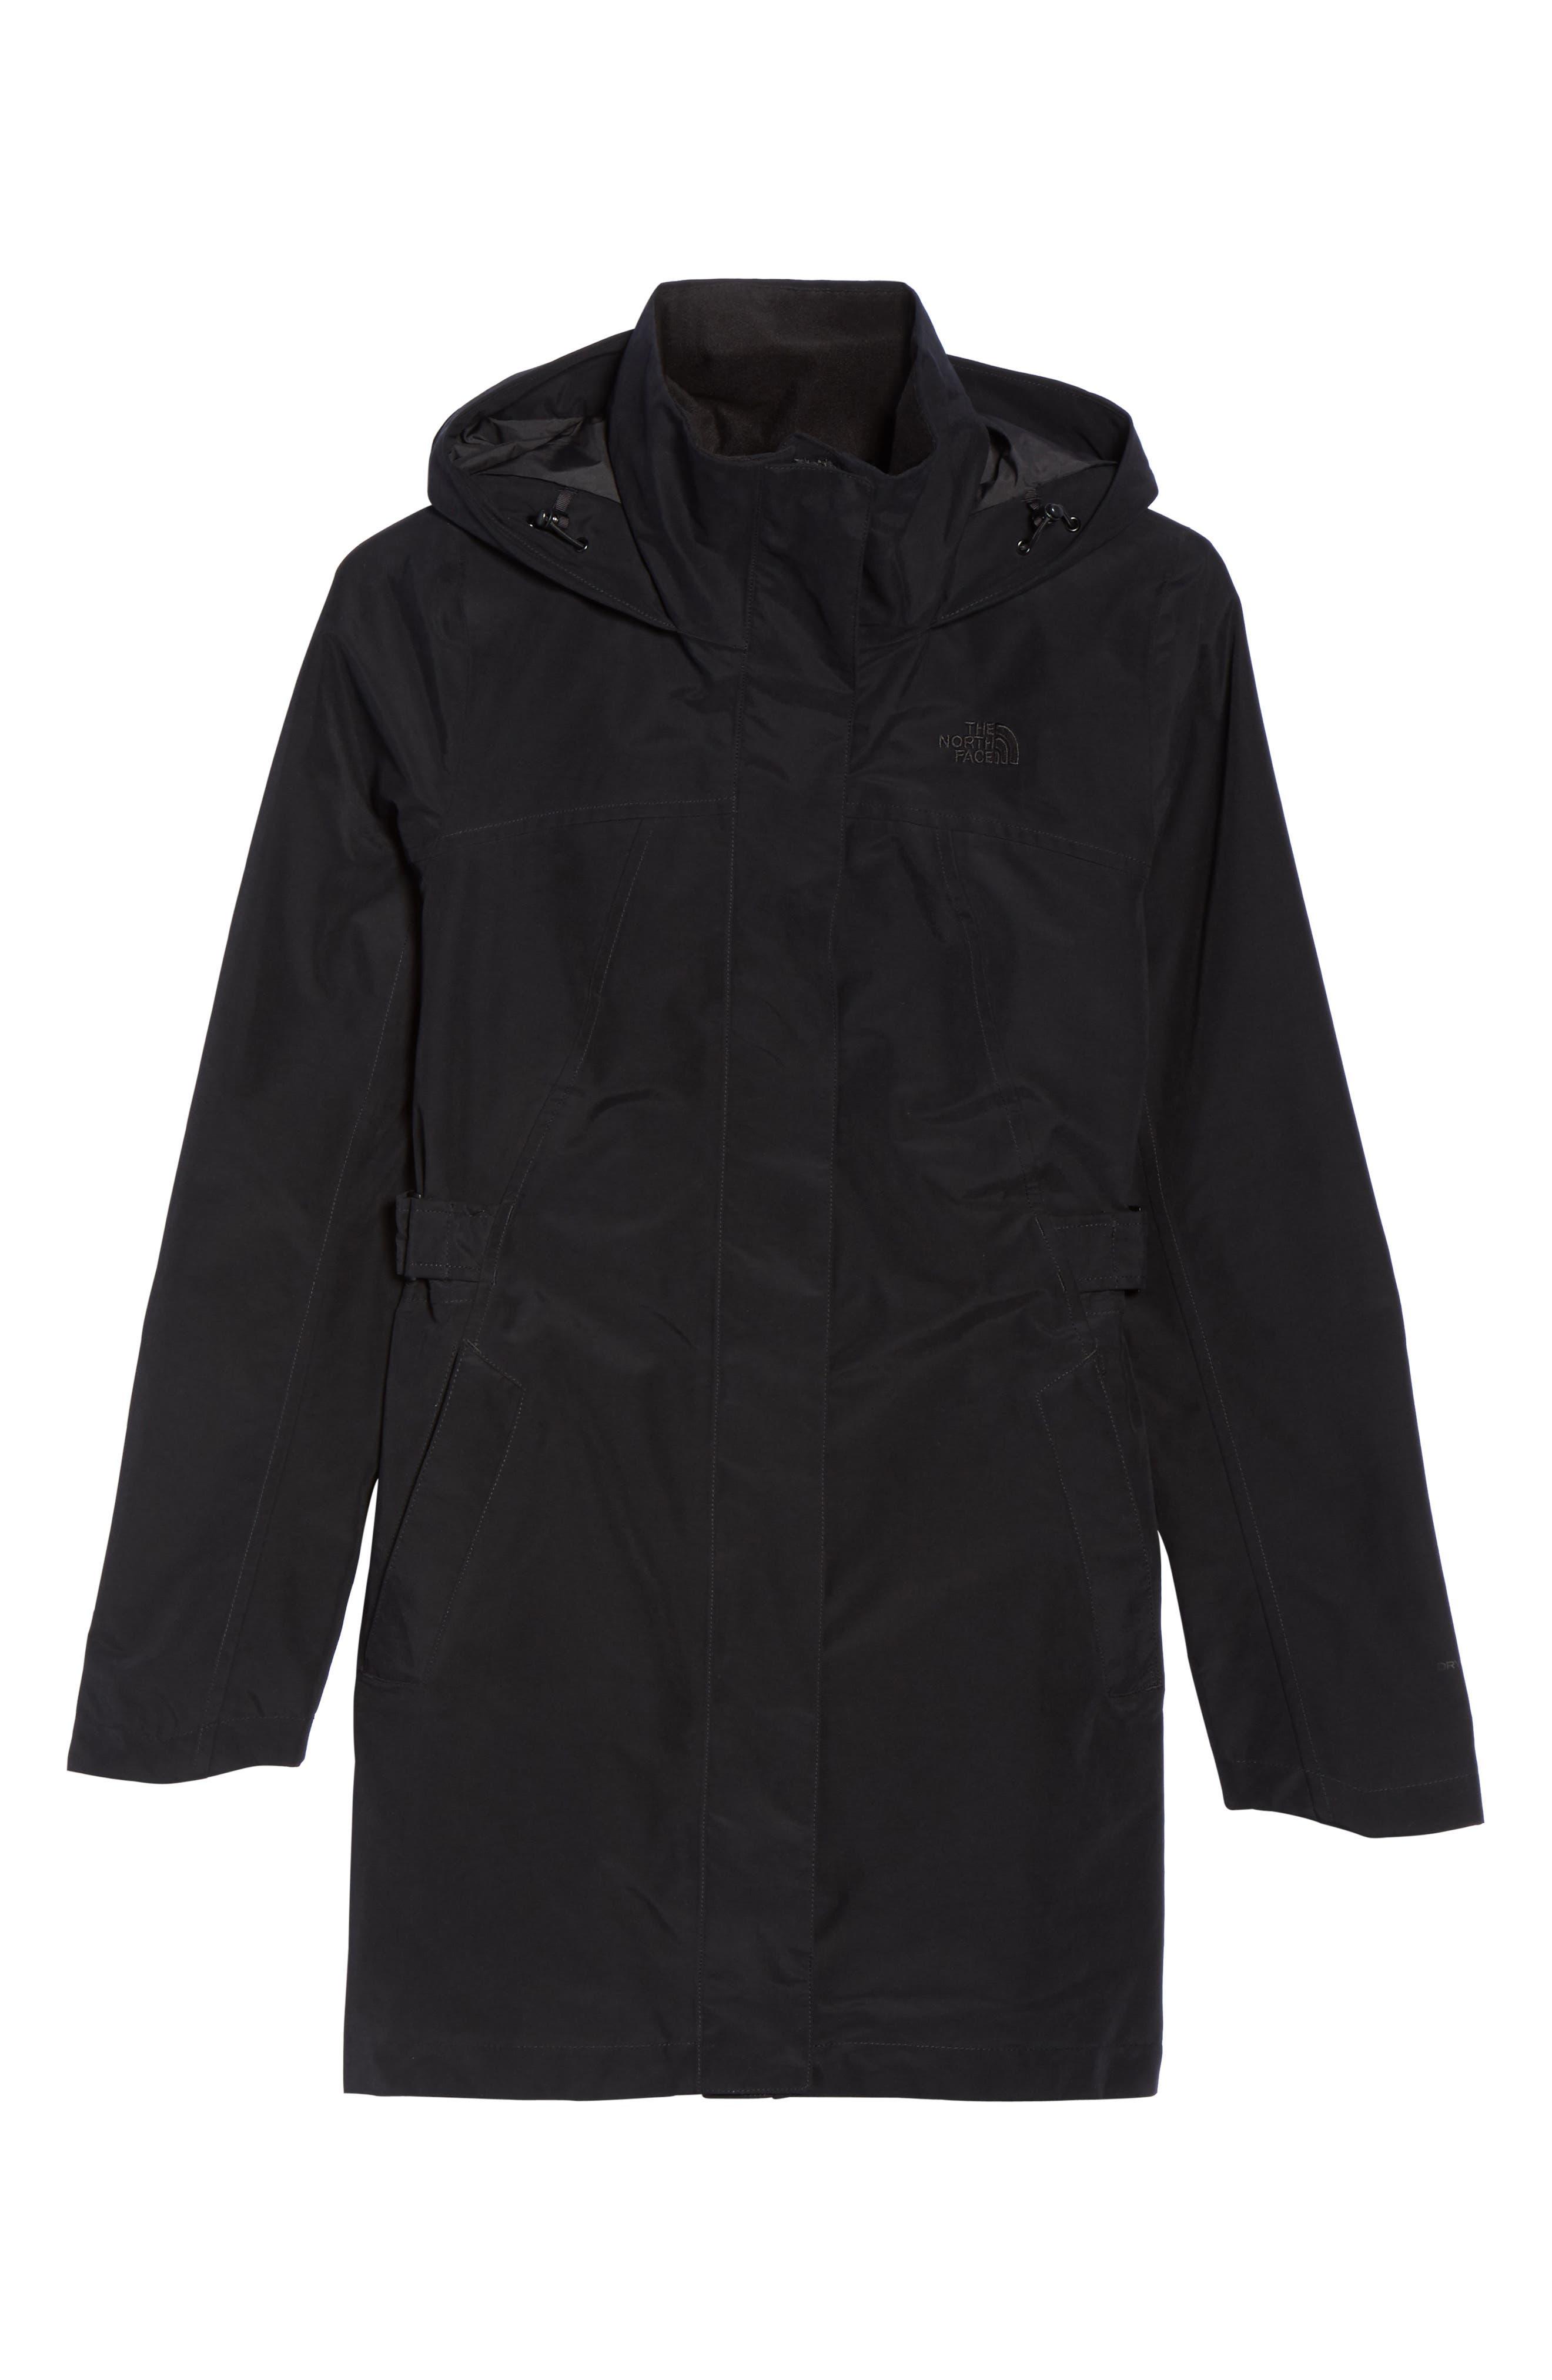 Laney II Trench Raincoat,                             Alternate thumbnail 7, color,                             Tnf Black